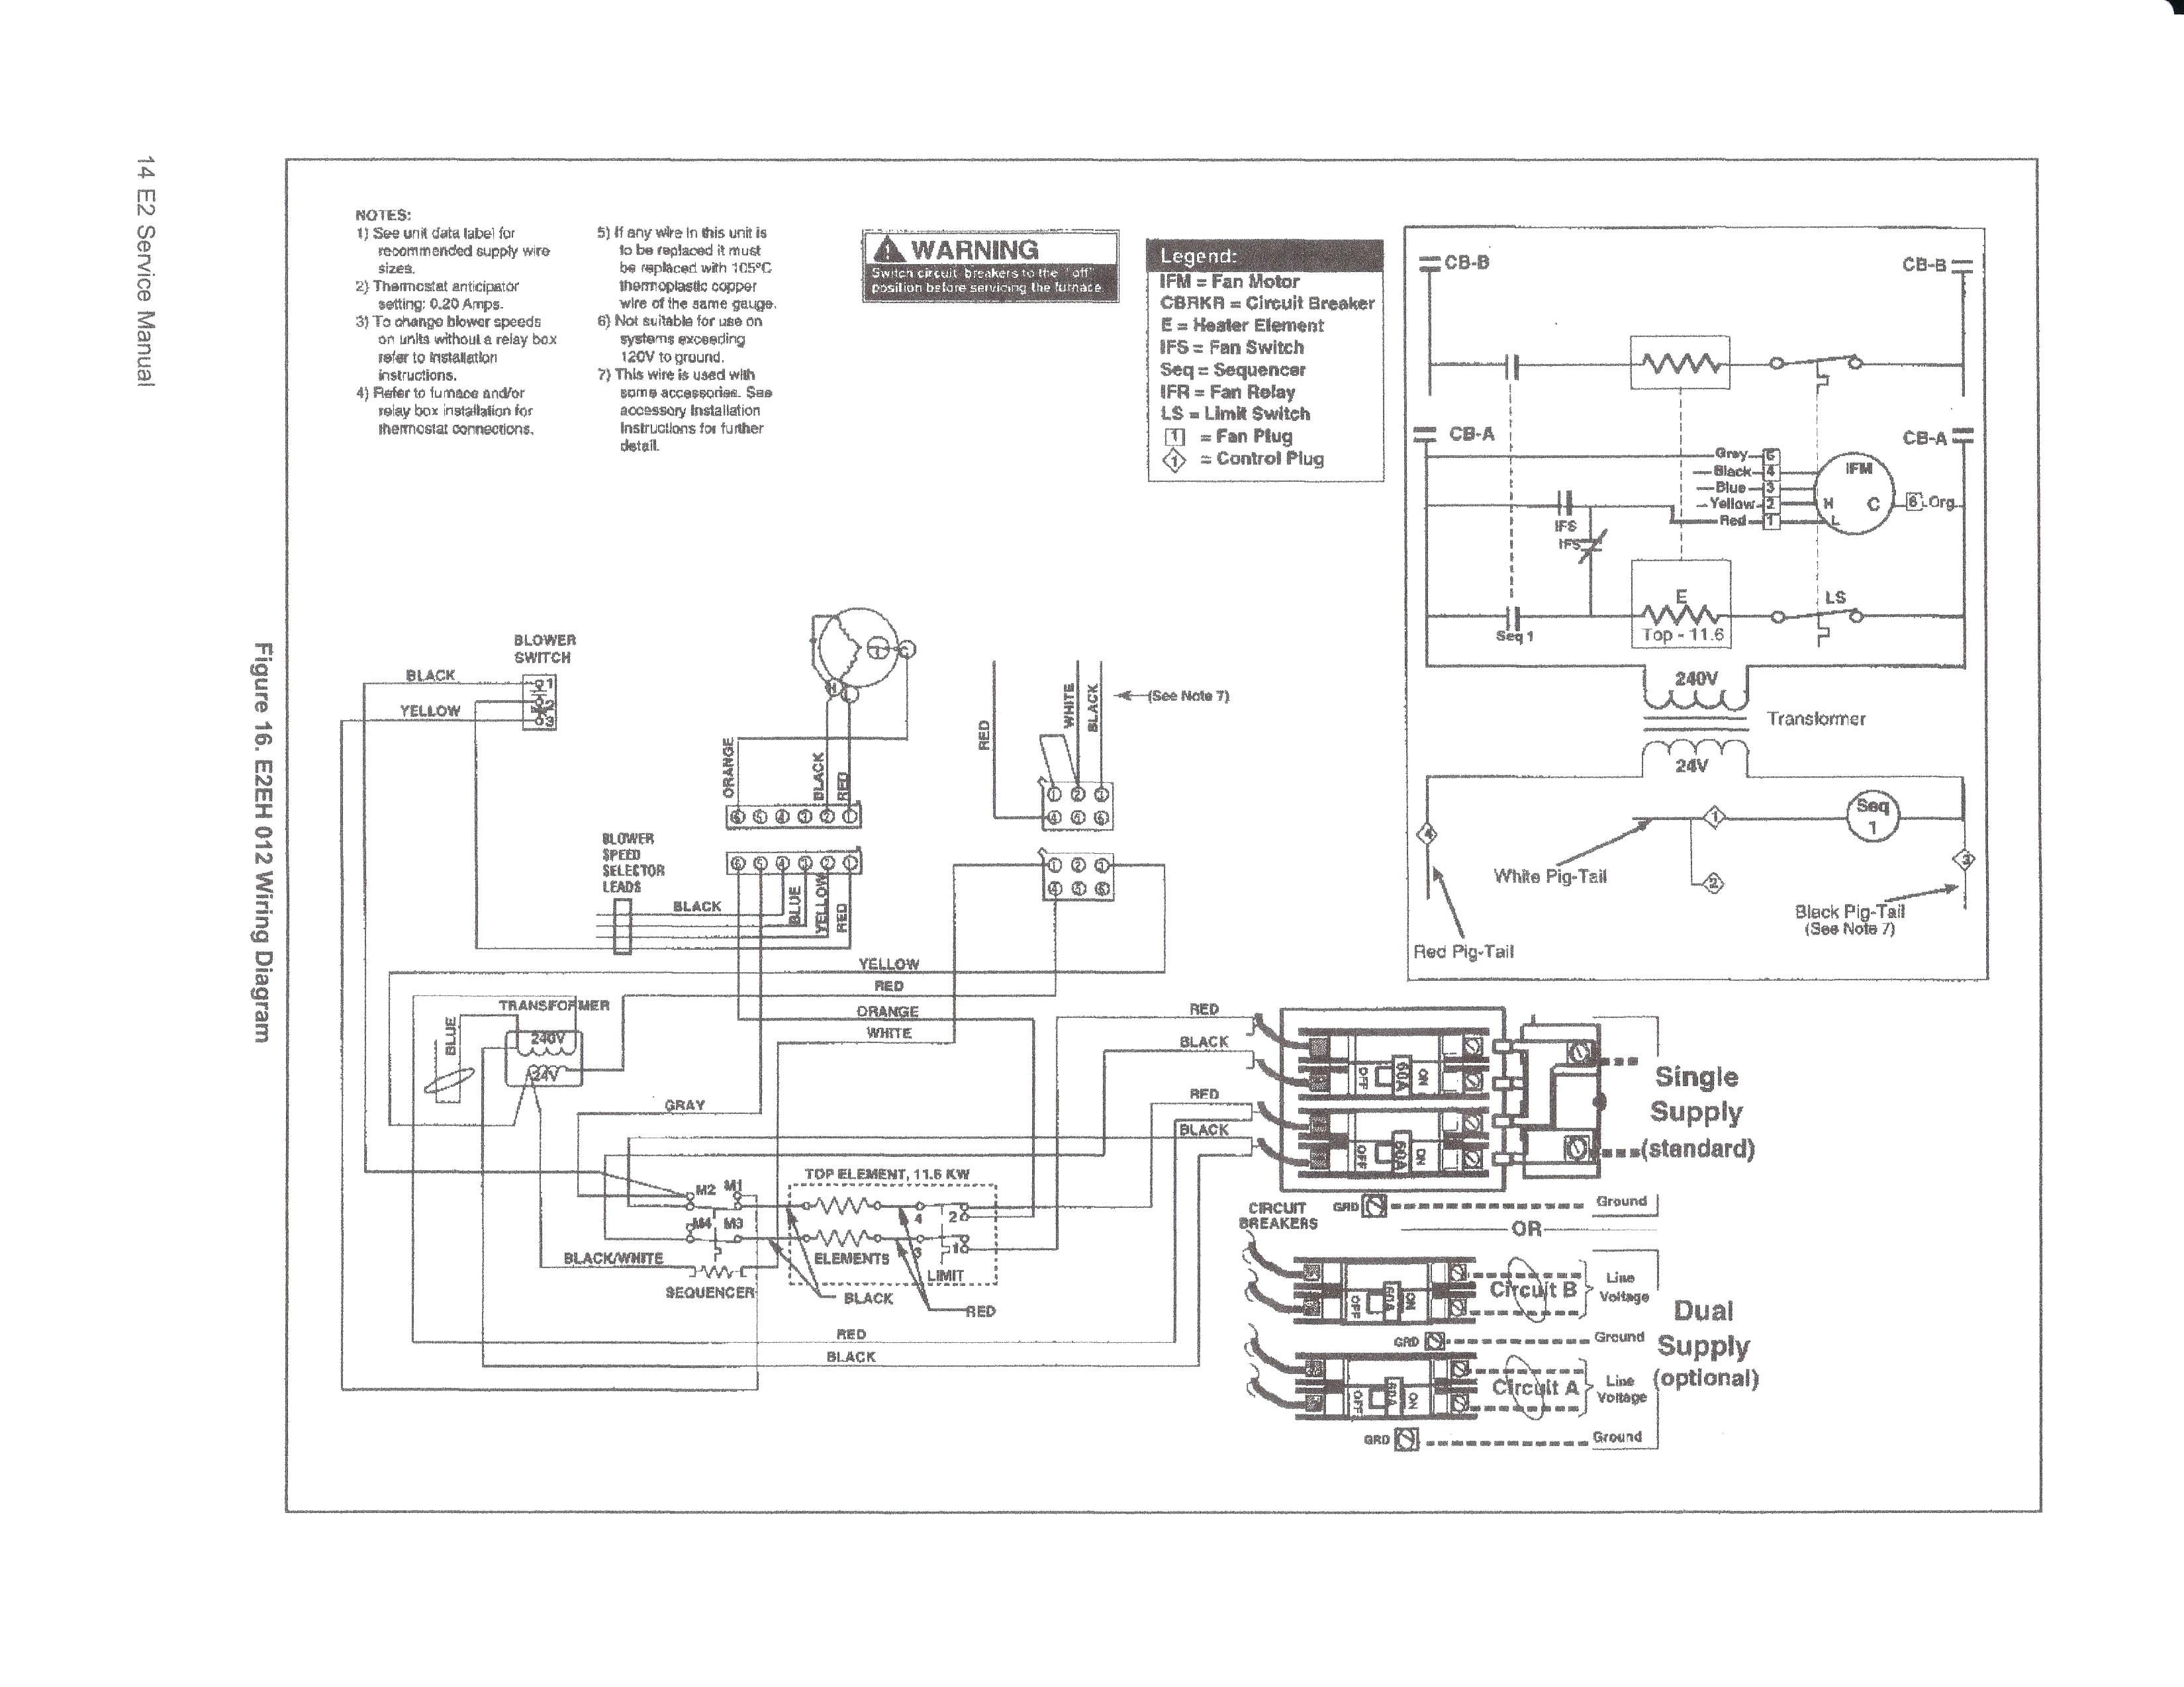 [SCHEMATICS_4LK]  XL_7737] Cal Spa Pump Wiring Diagram Free Diagram | La Spas Circulation Motor Pump Wiring Diagram |  | Para Gram Osoph Epete Impa Xeira Mohammedshrine Librar Wiring 101